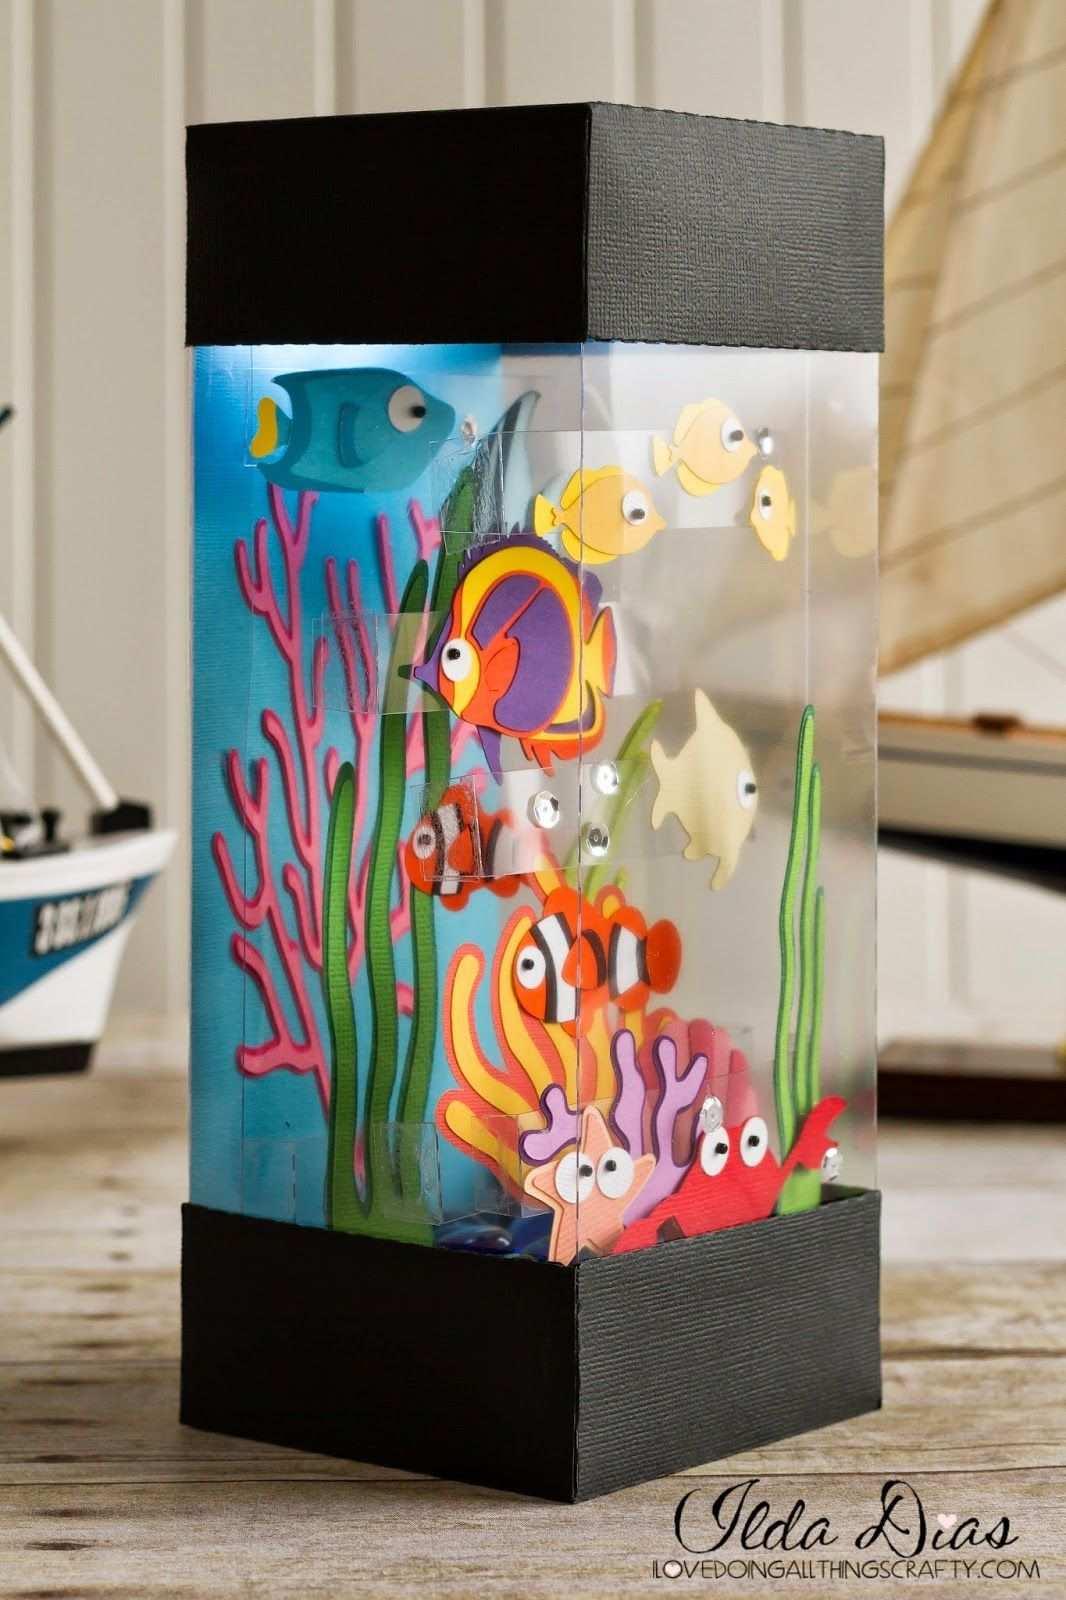 33 Paper Craft Art Crafttel Com Aquarium Craft Paper Crafts Crafts